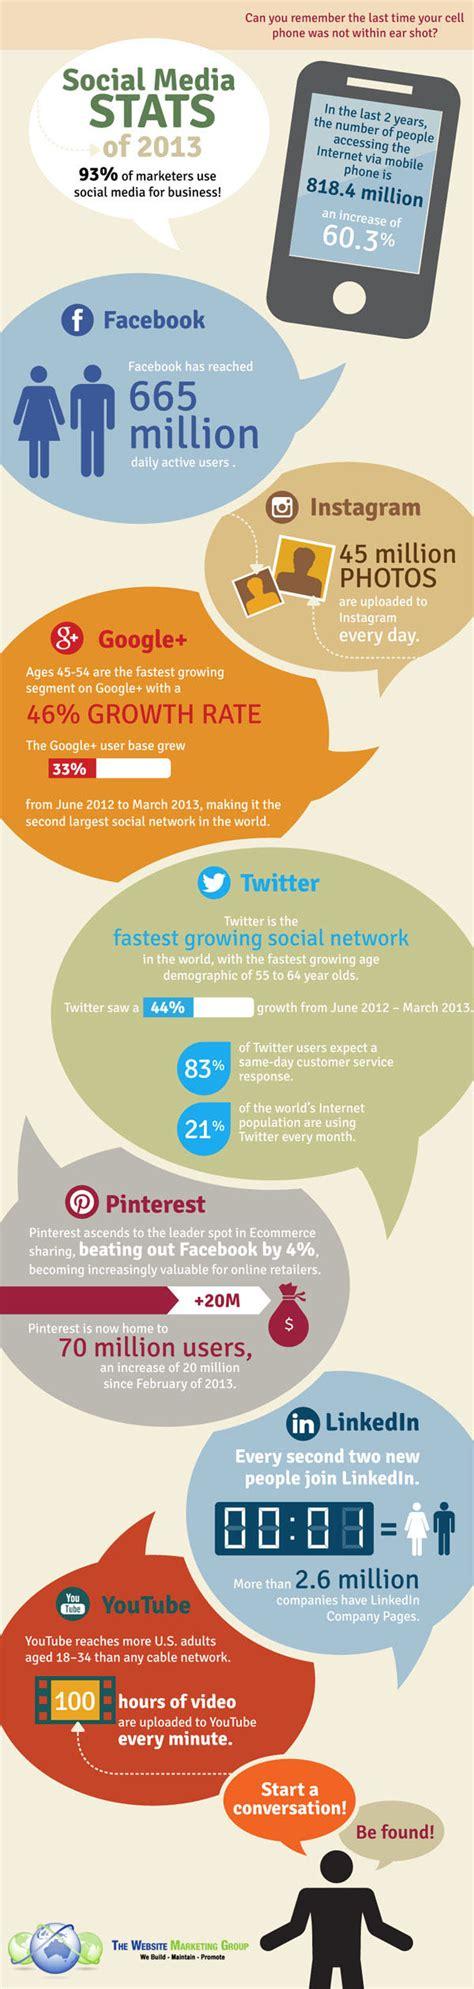 si鑒e sociale social media ecco le statistiche 2013